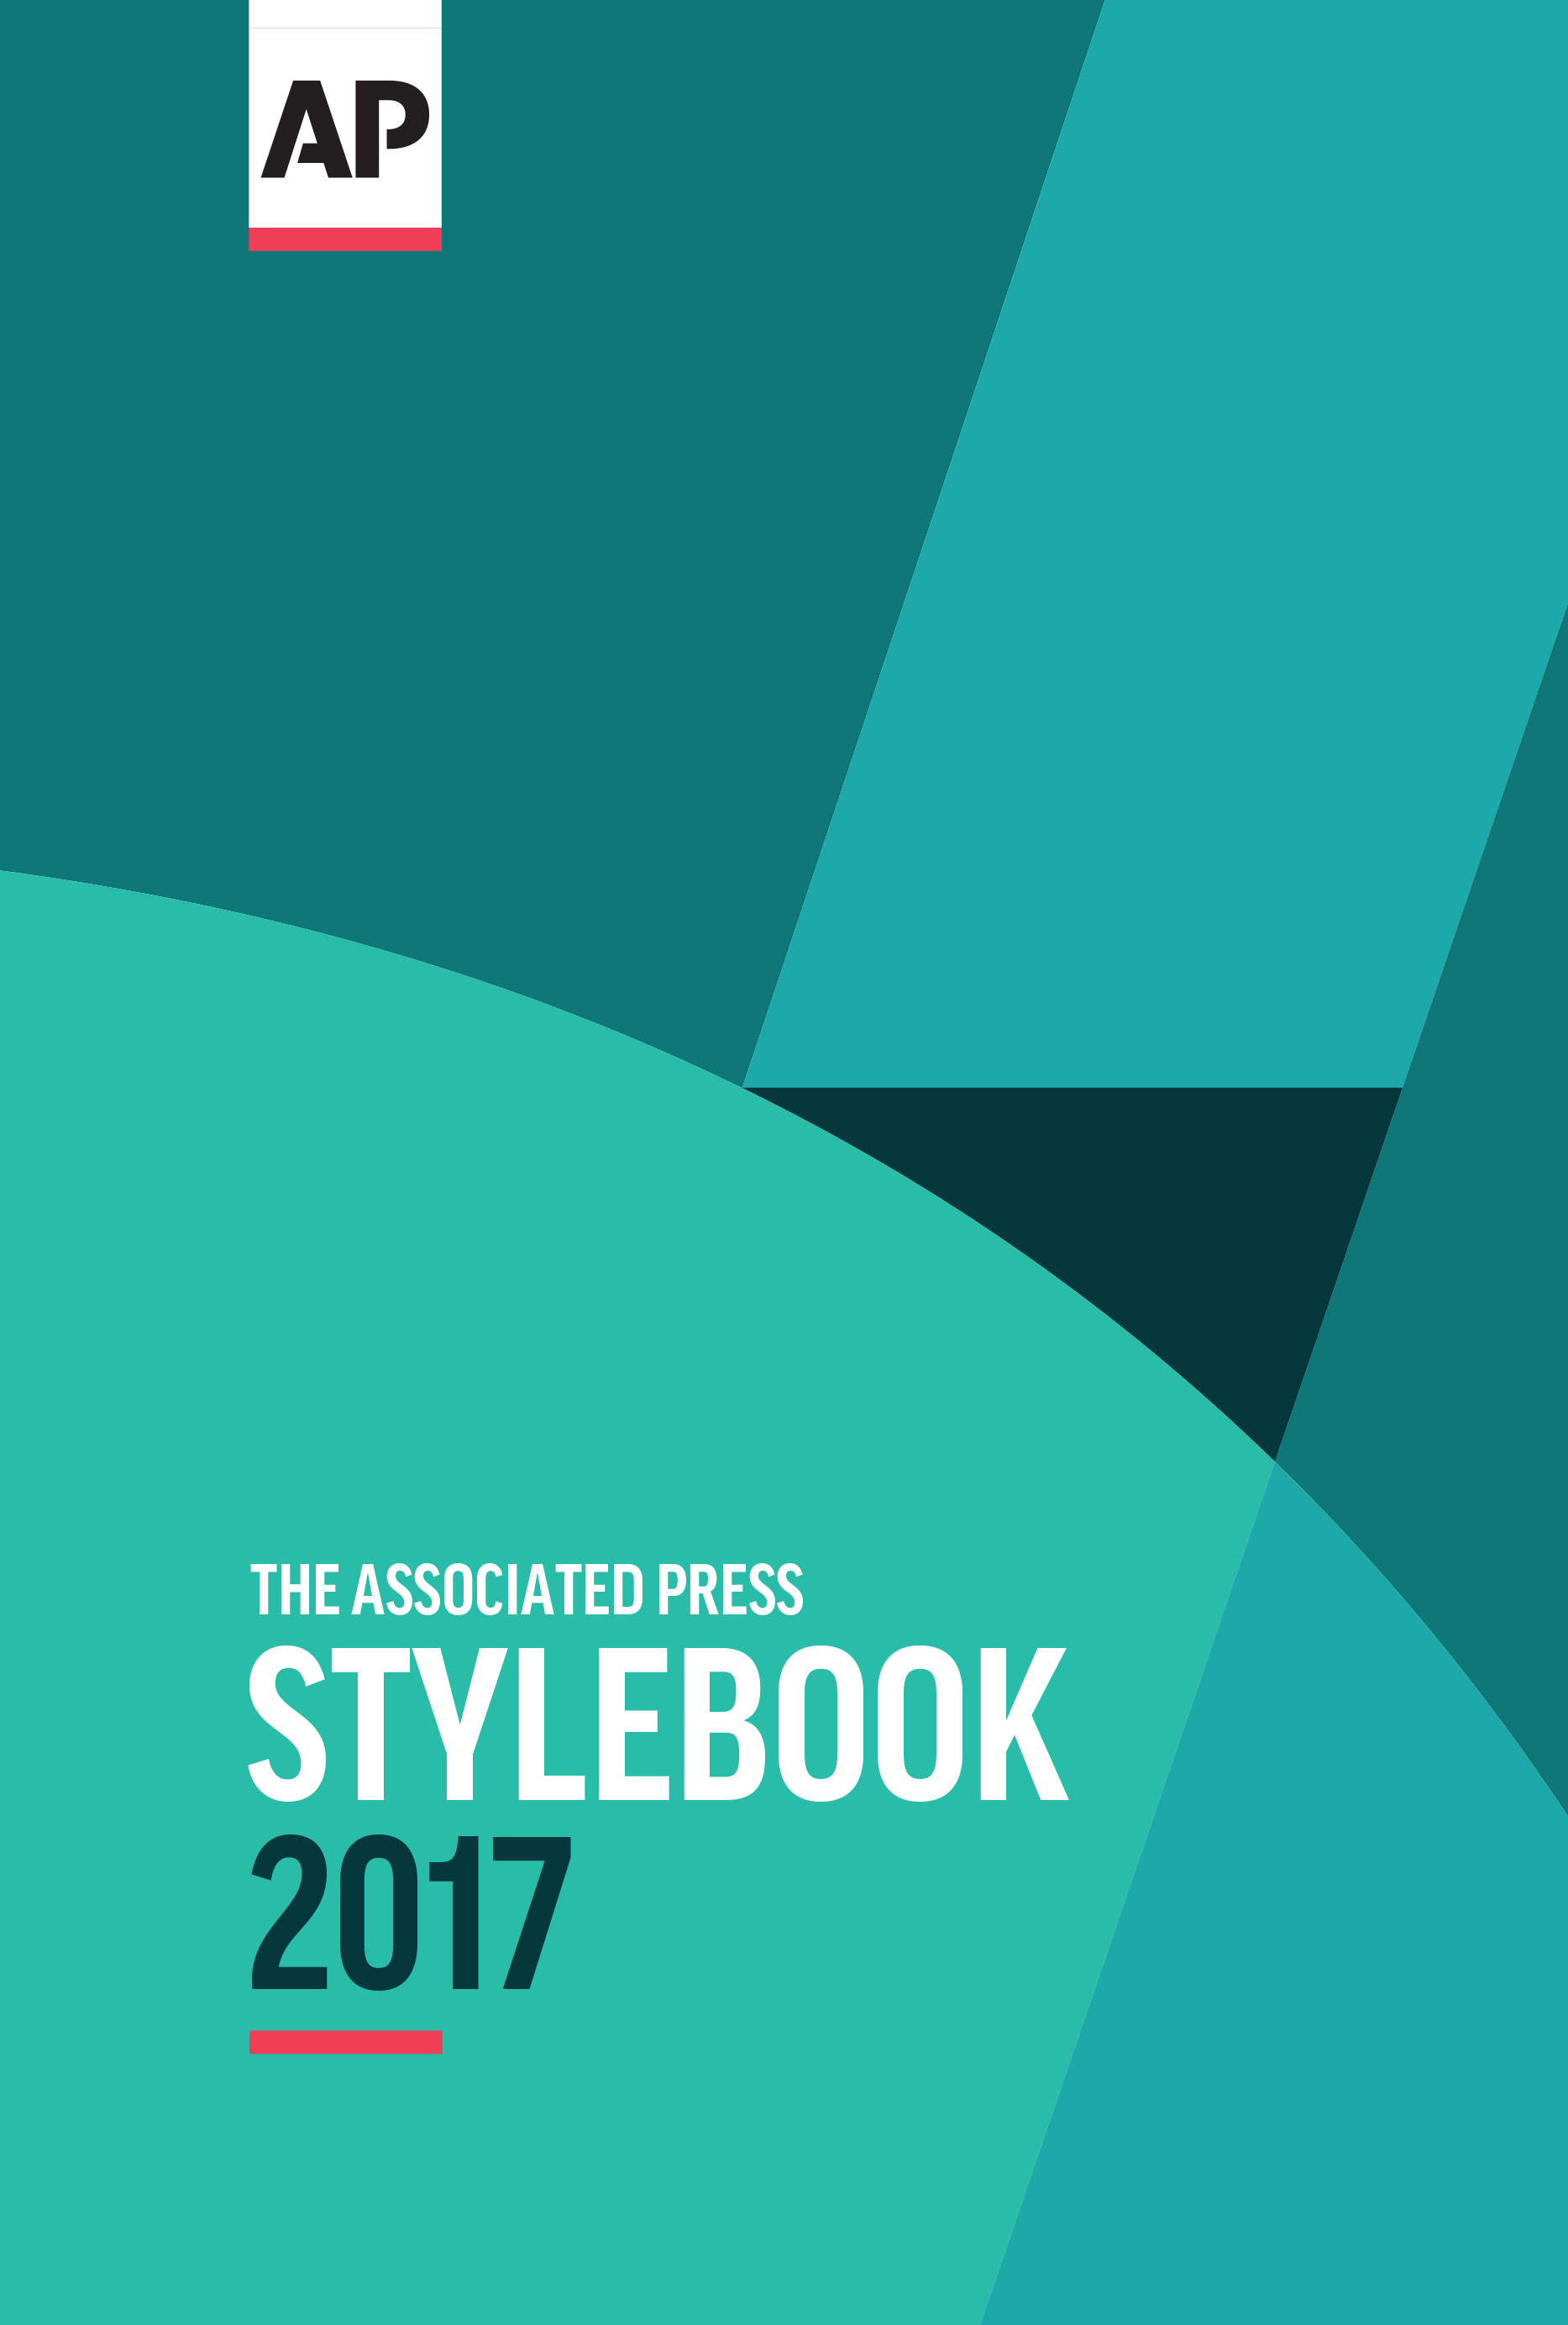 2017 AP Stylebook (print edition)